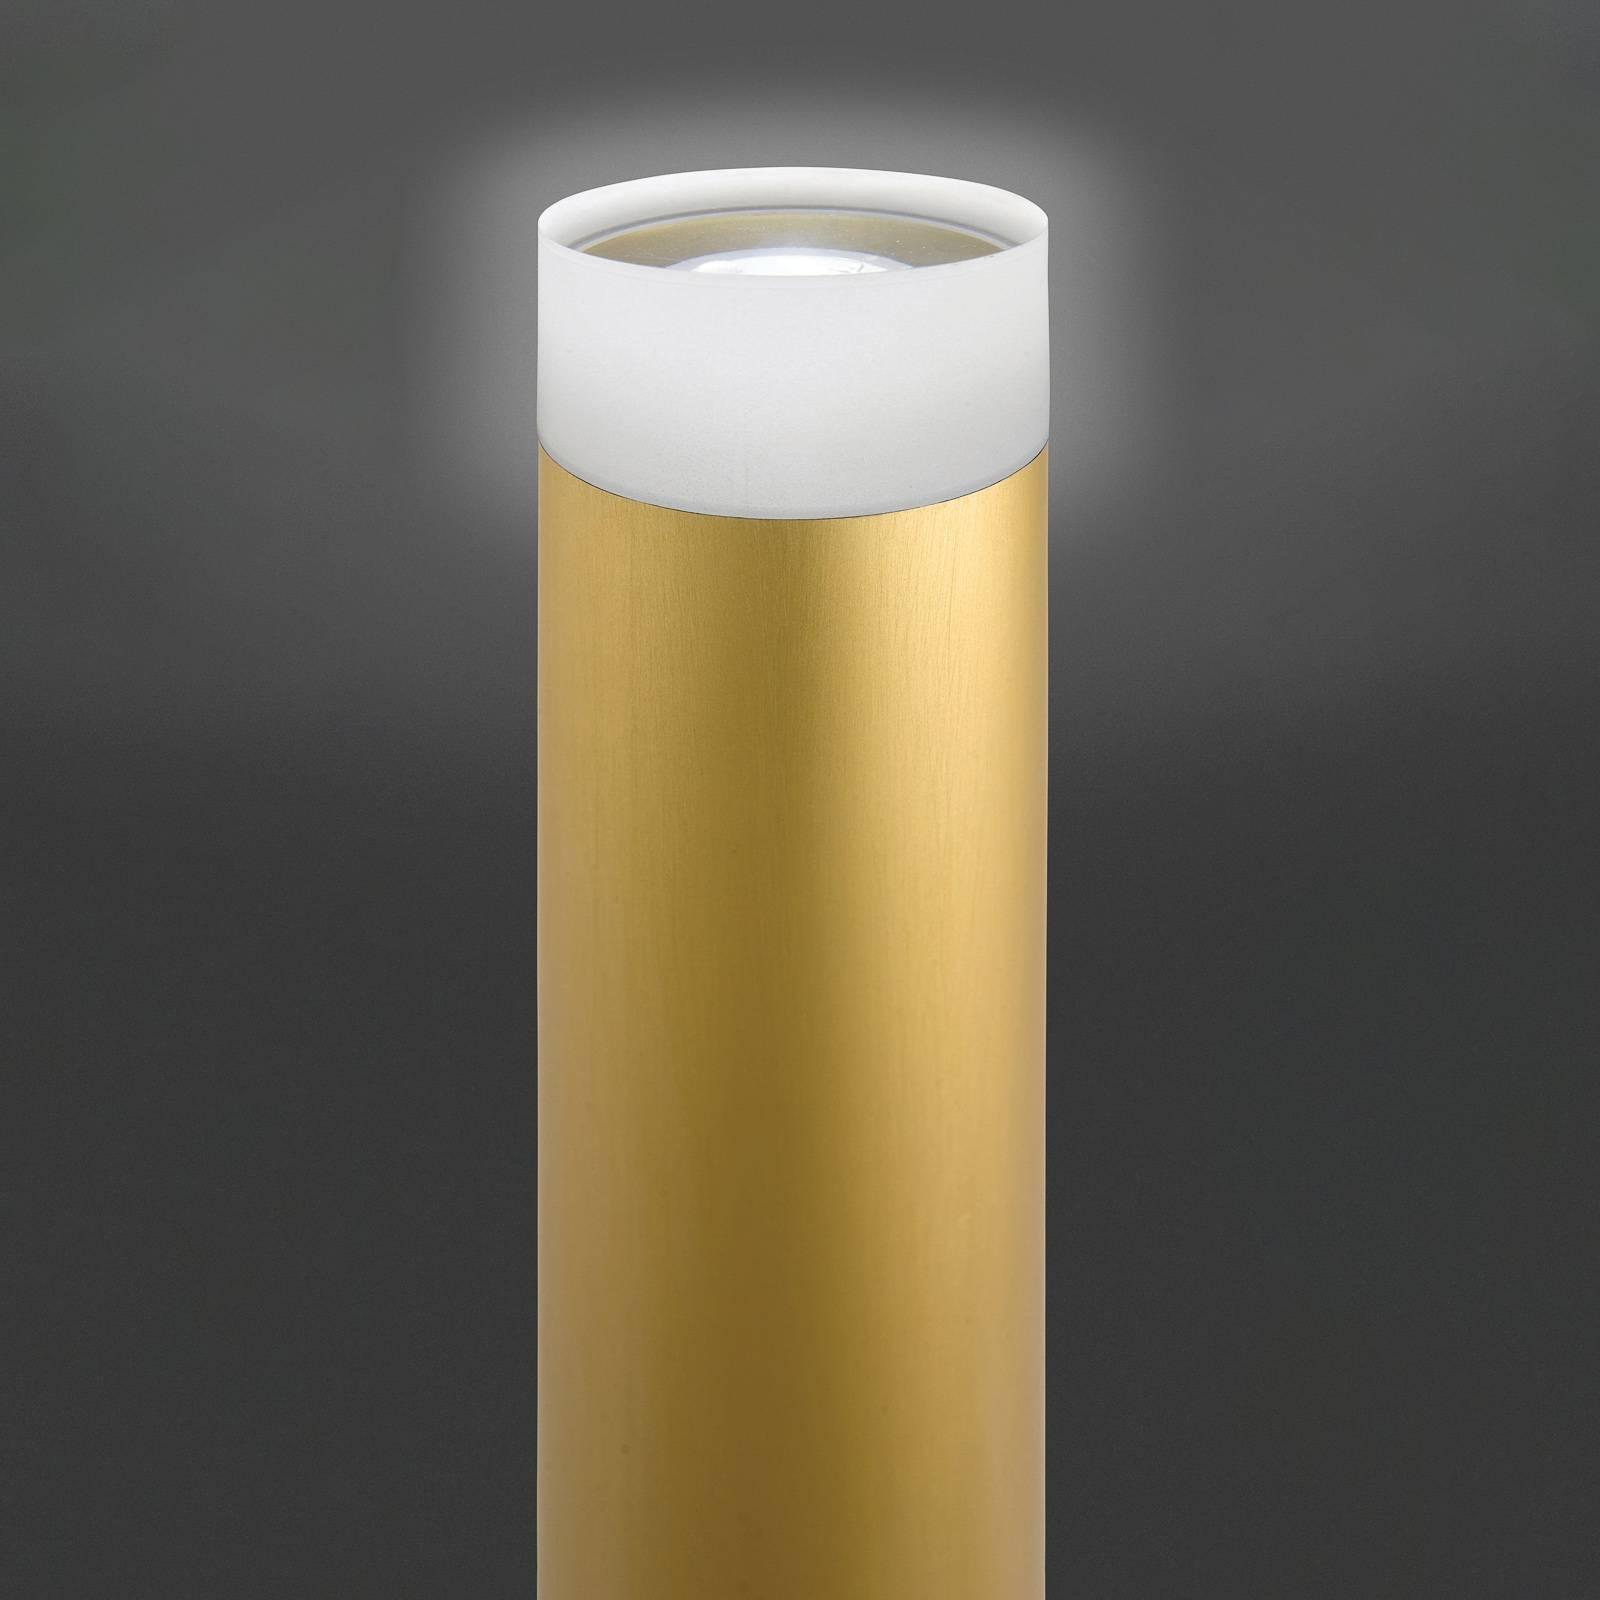 Lattiavalo LED Pole, anodisoitu kulta